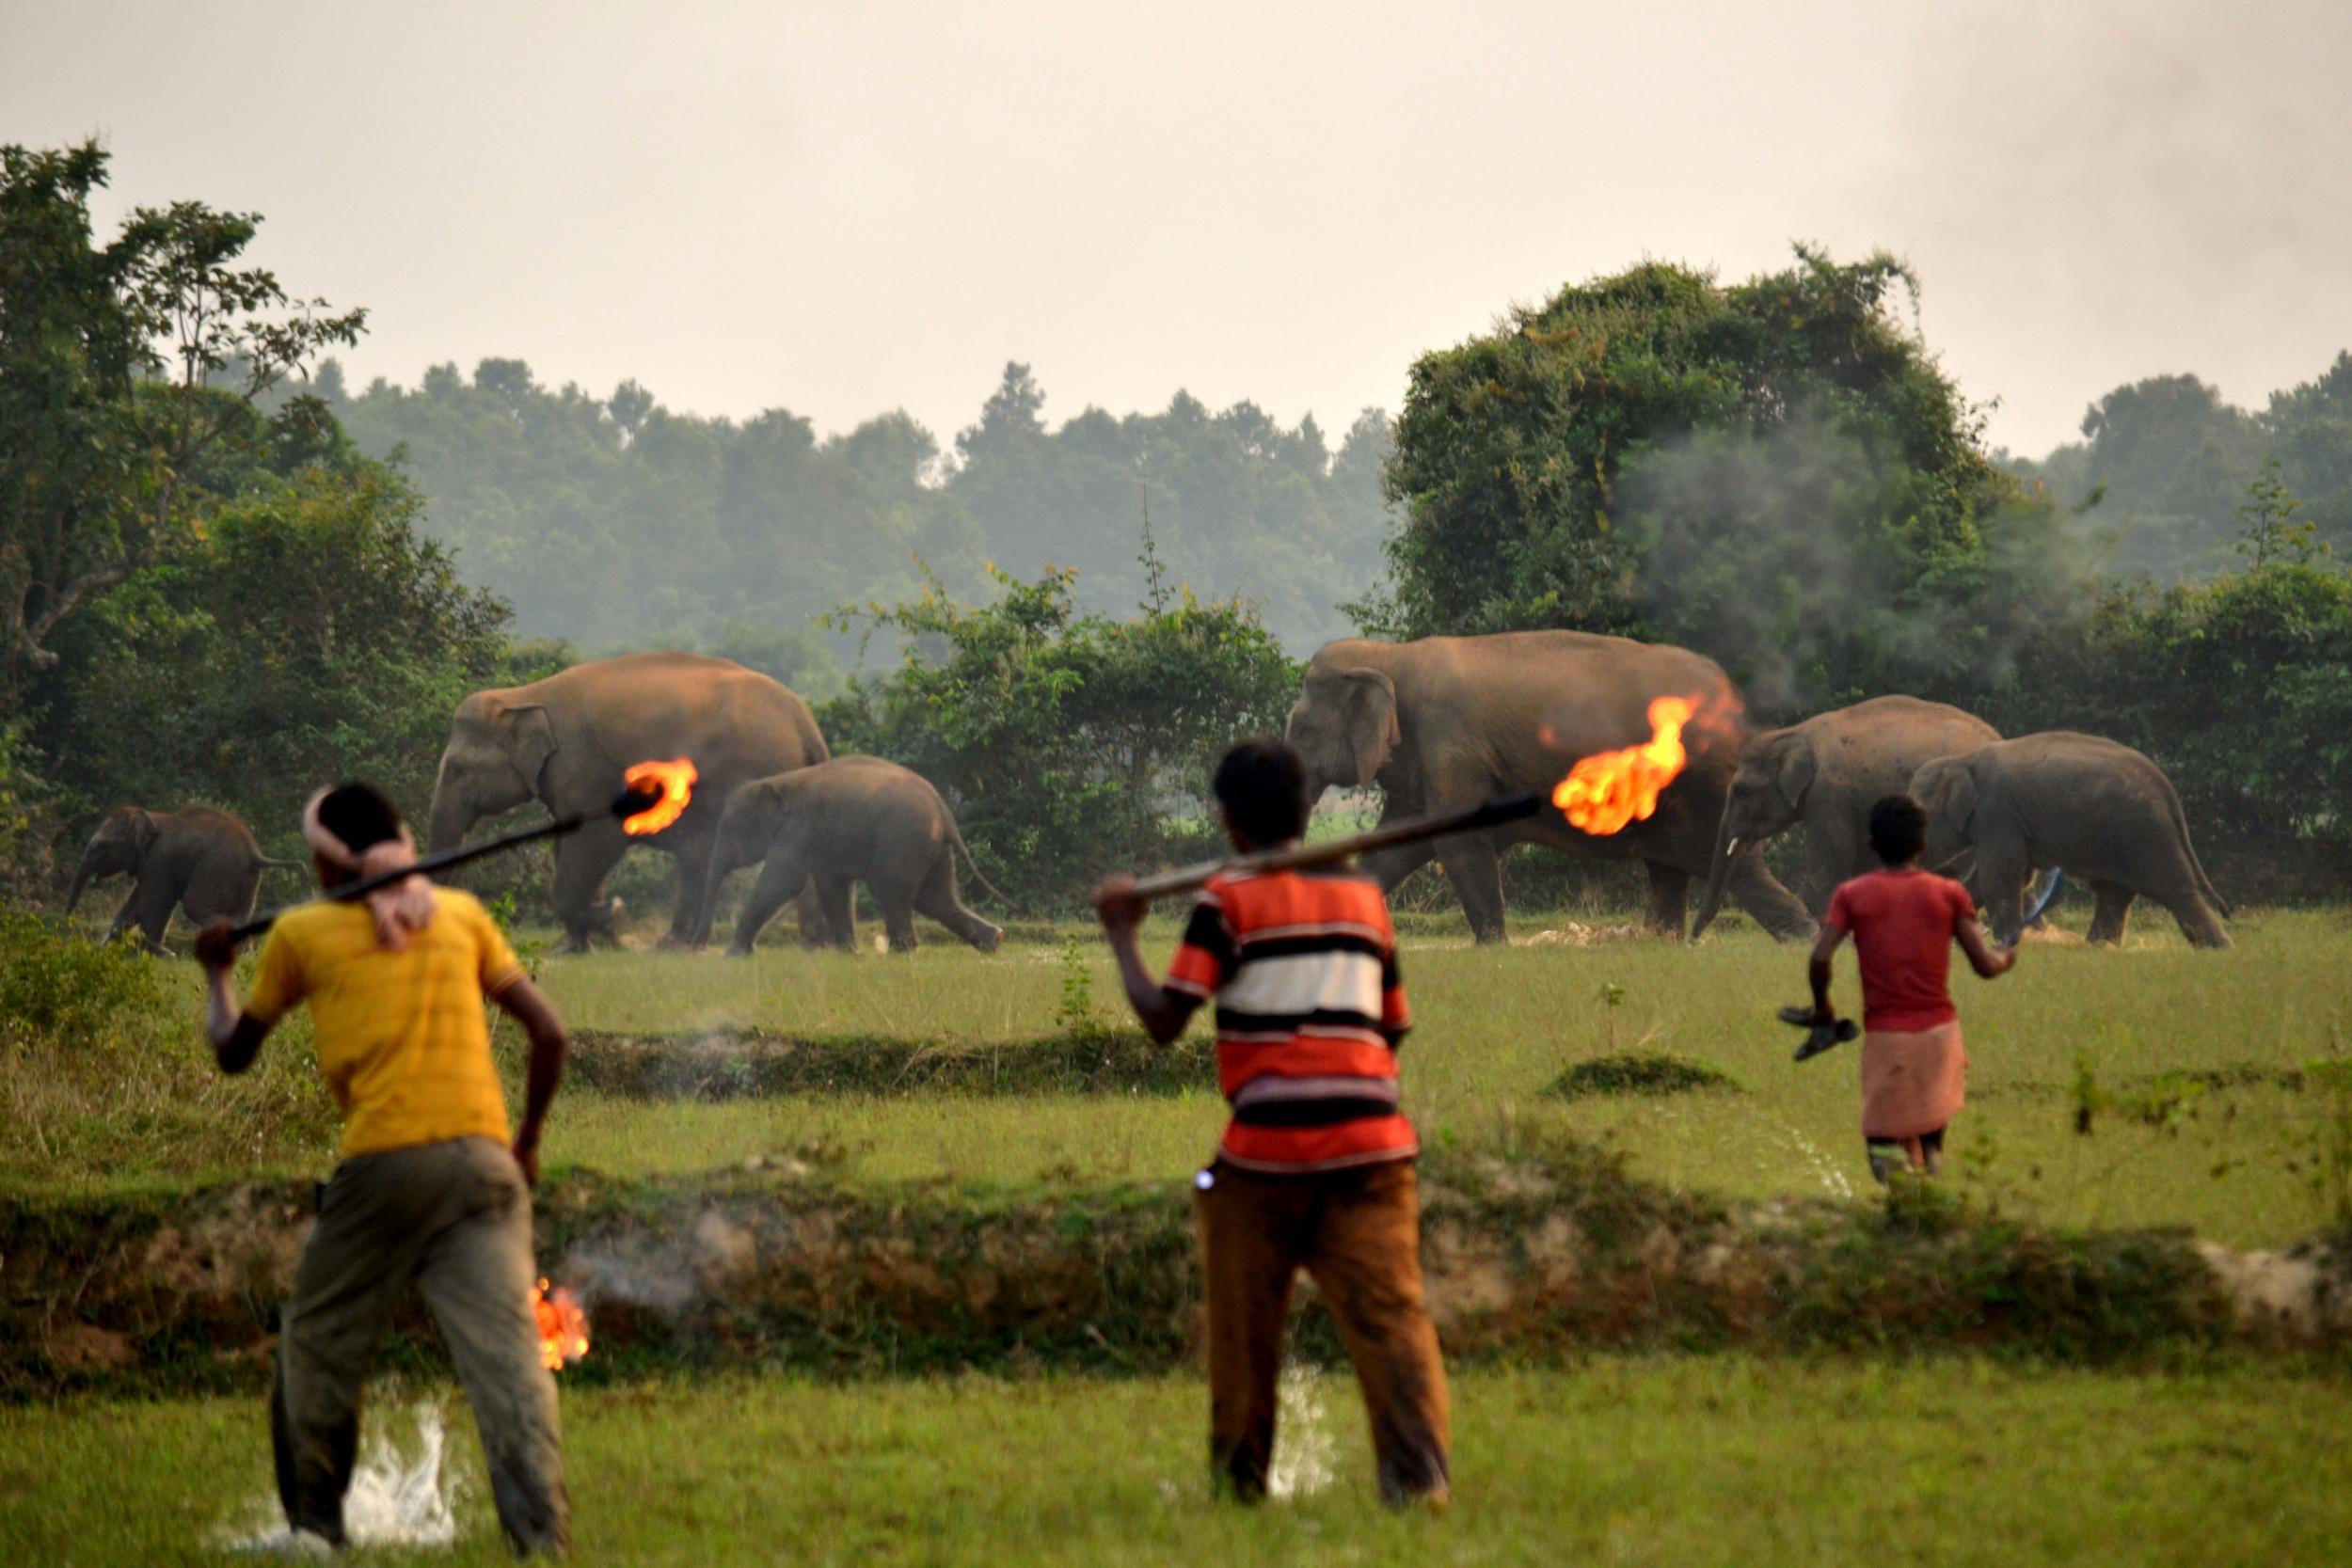 elephant-fire-sticks.jpg